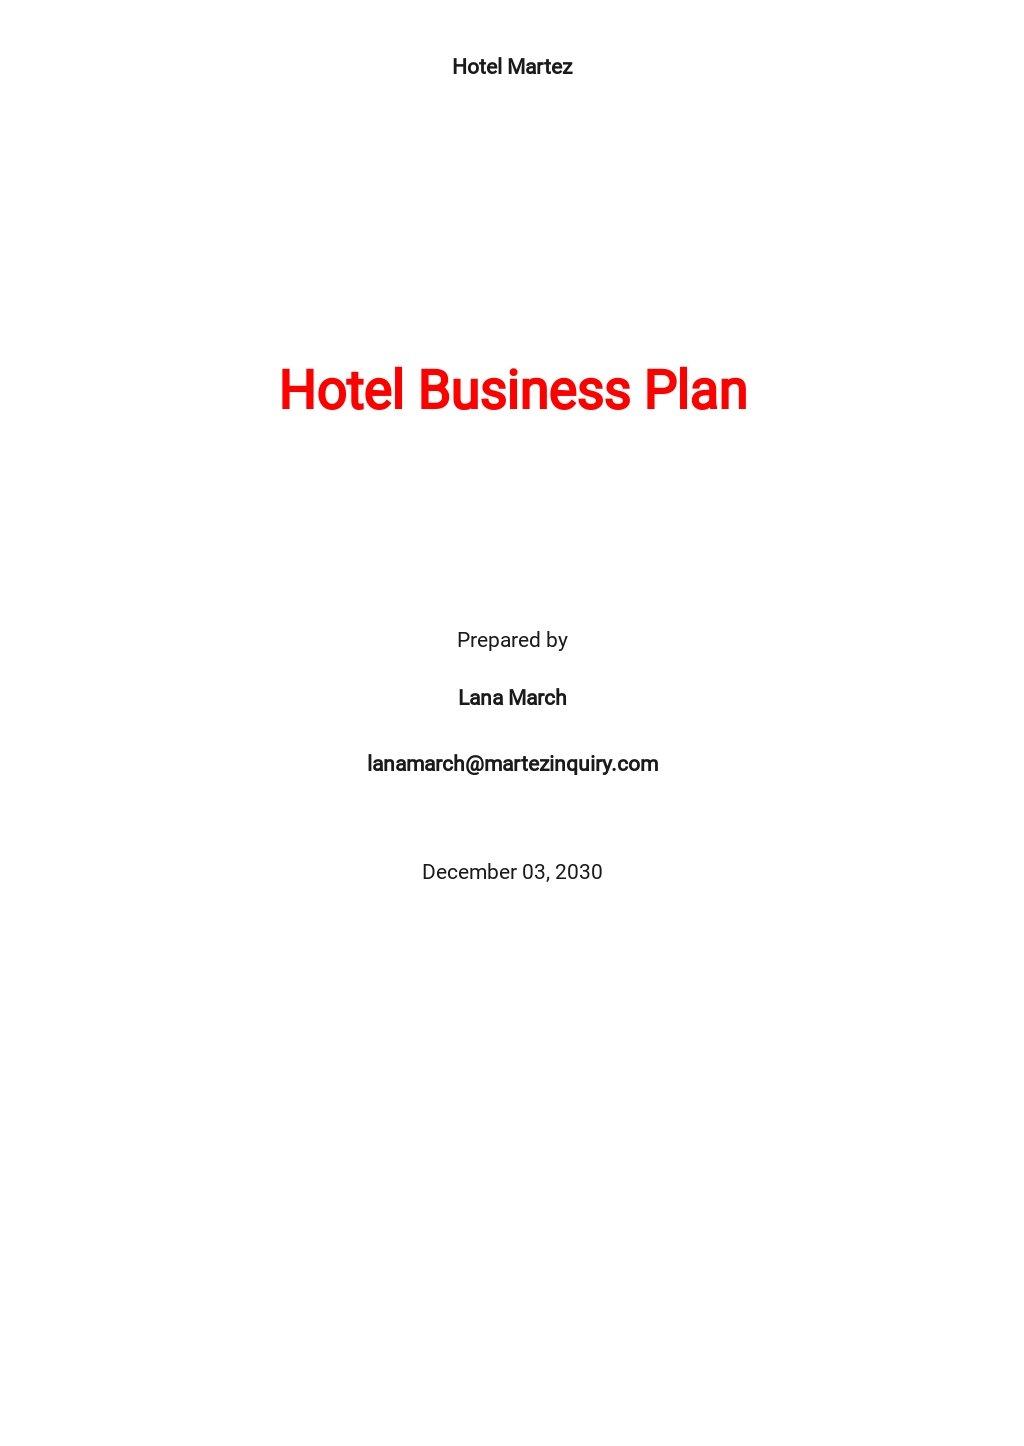 Hotel Business Plan Template.jpe